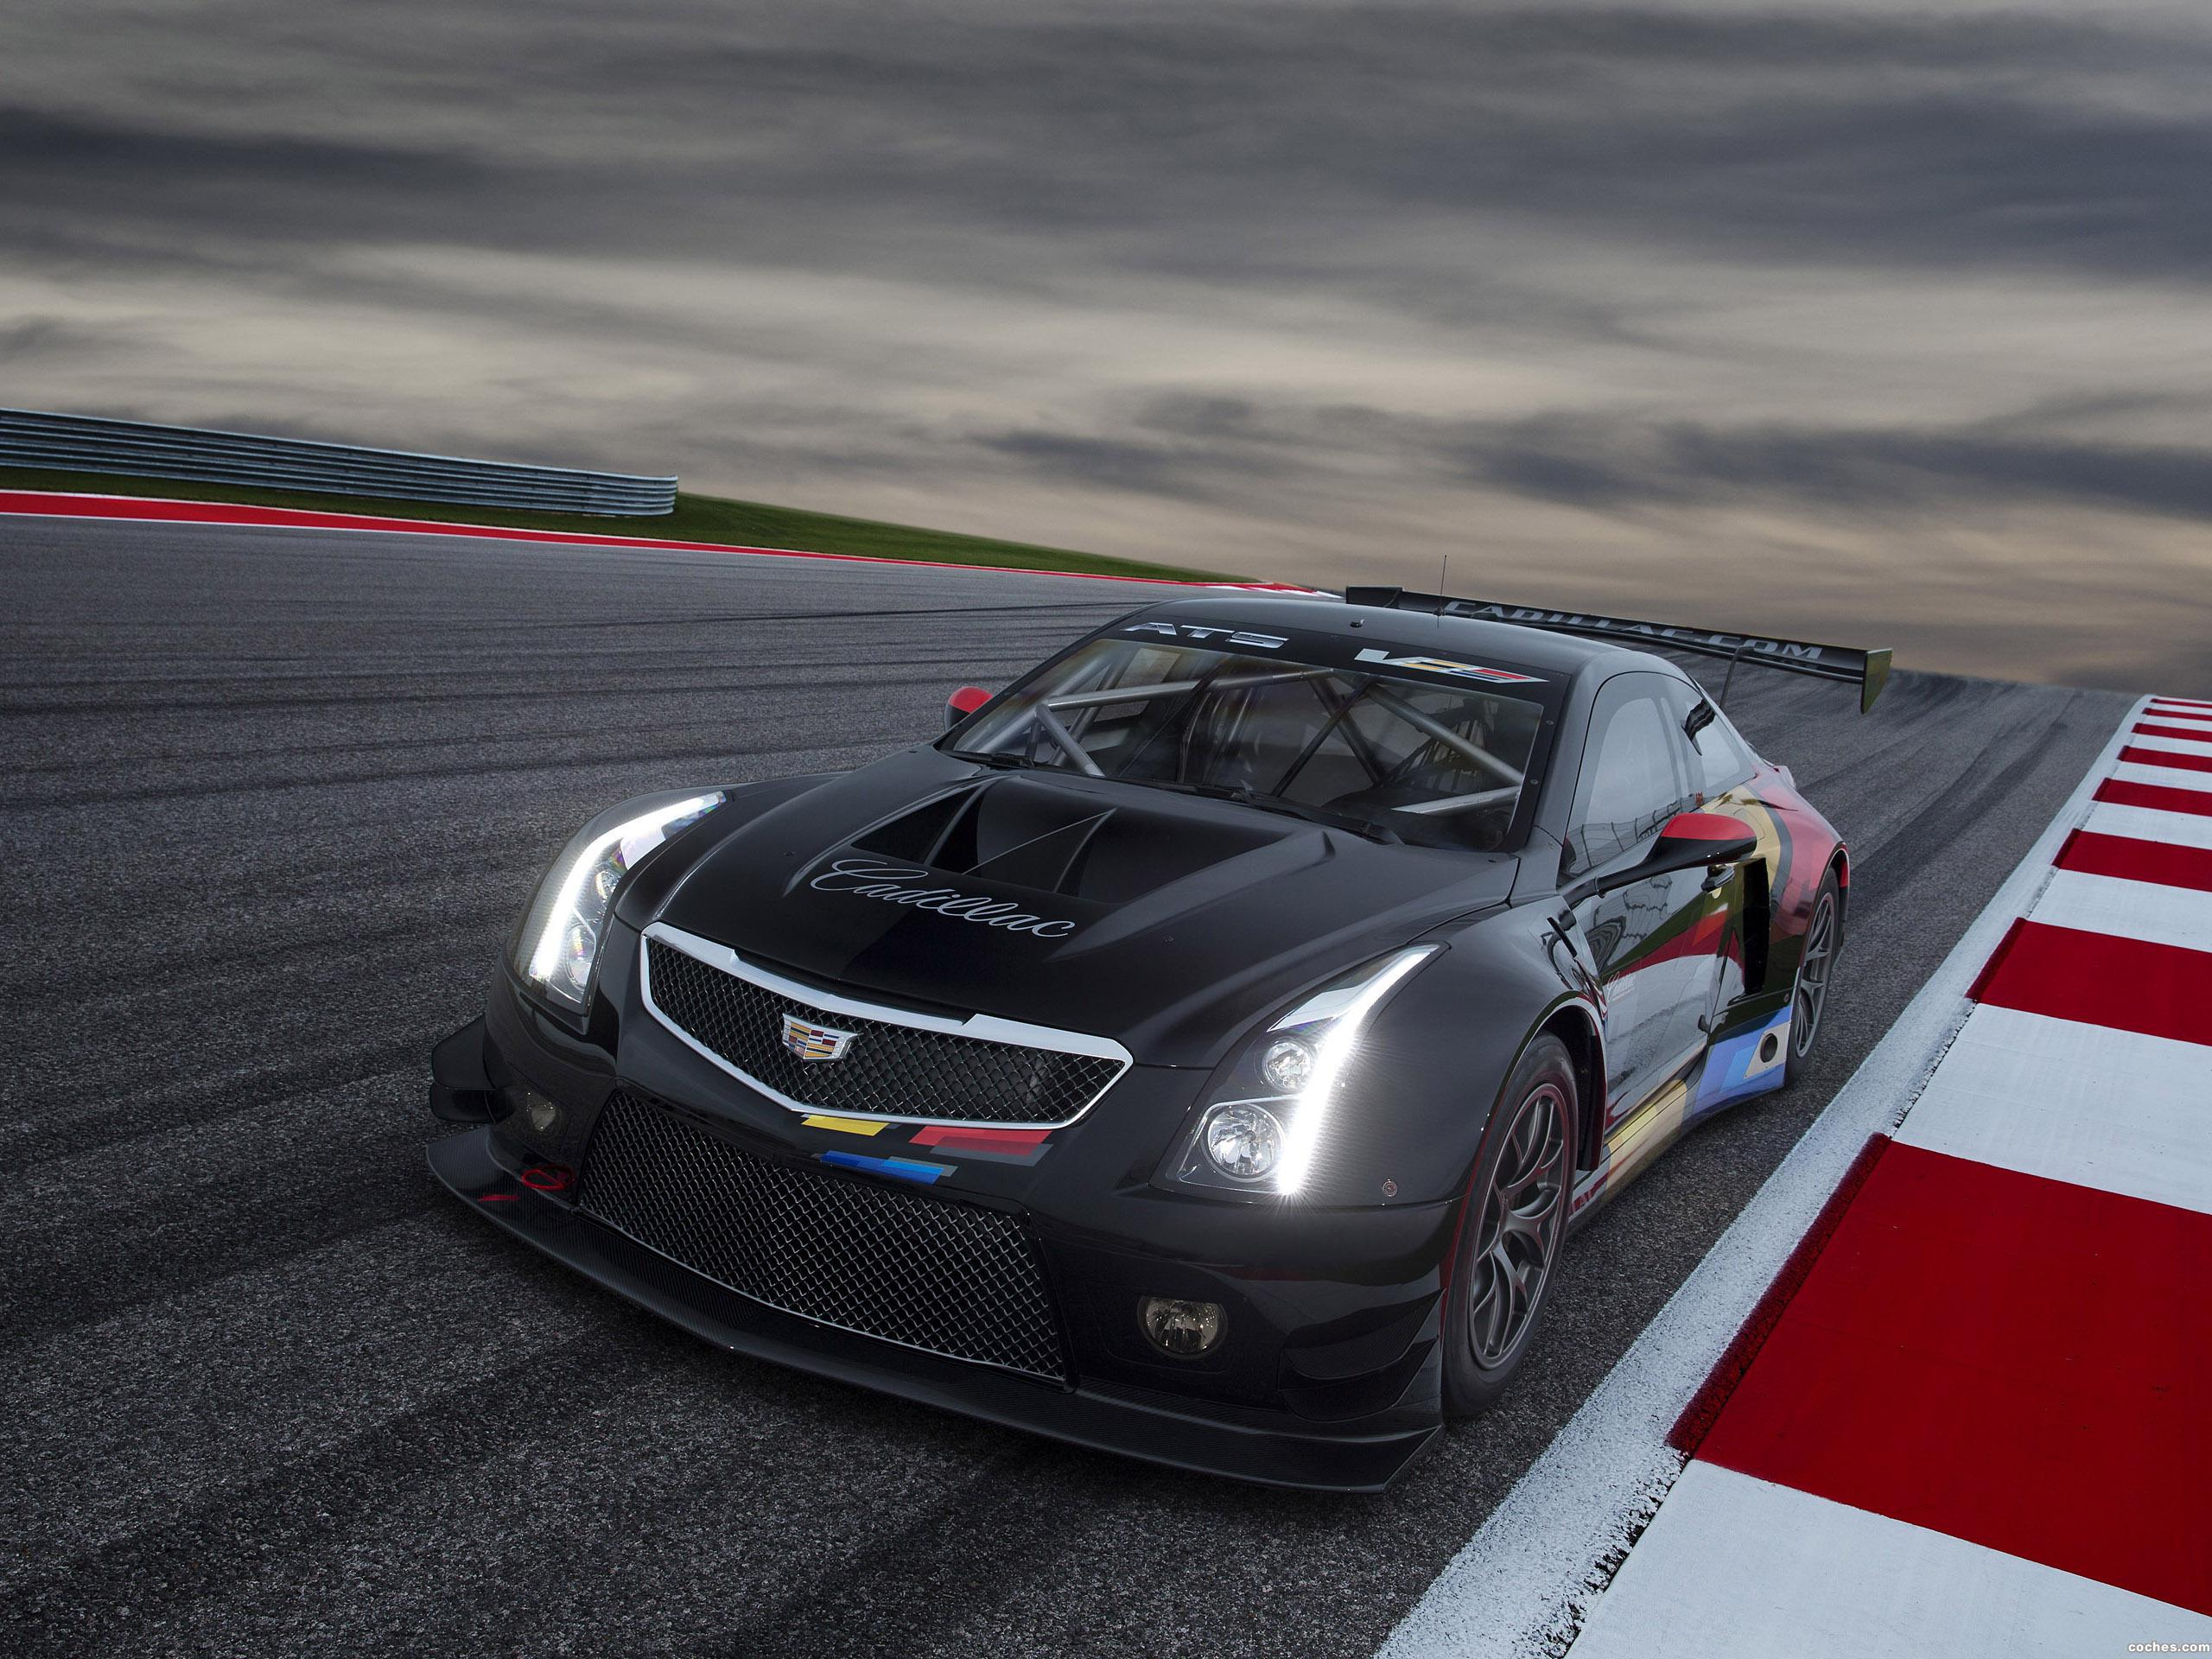 | PC2 BLANCPAIN GT3 SERIES T.IV | FFC__QUINI13 y Sennalauda12 equipo campeón Cadillac_ats-vsport-gt3-2015_r6